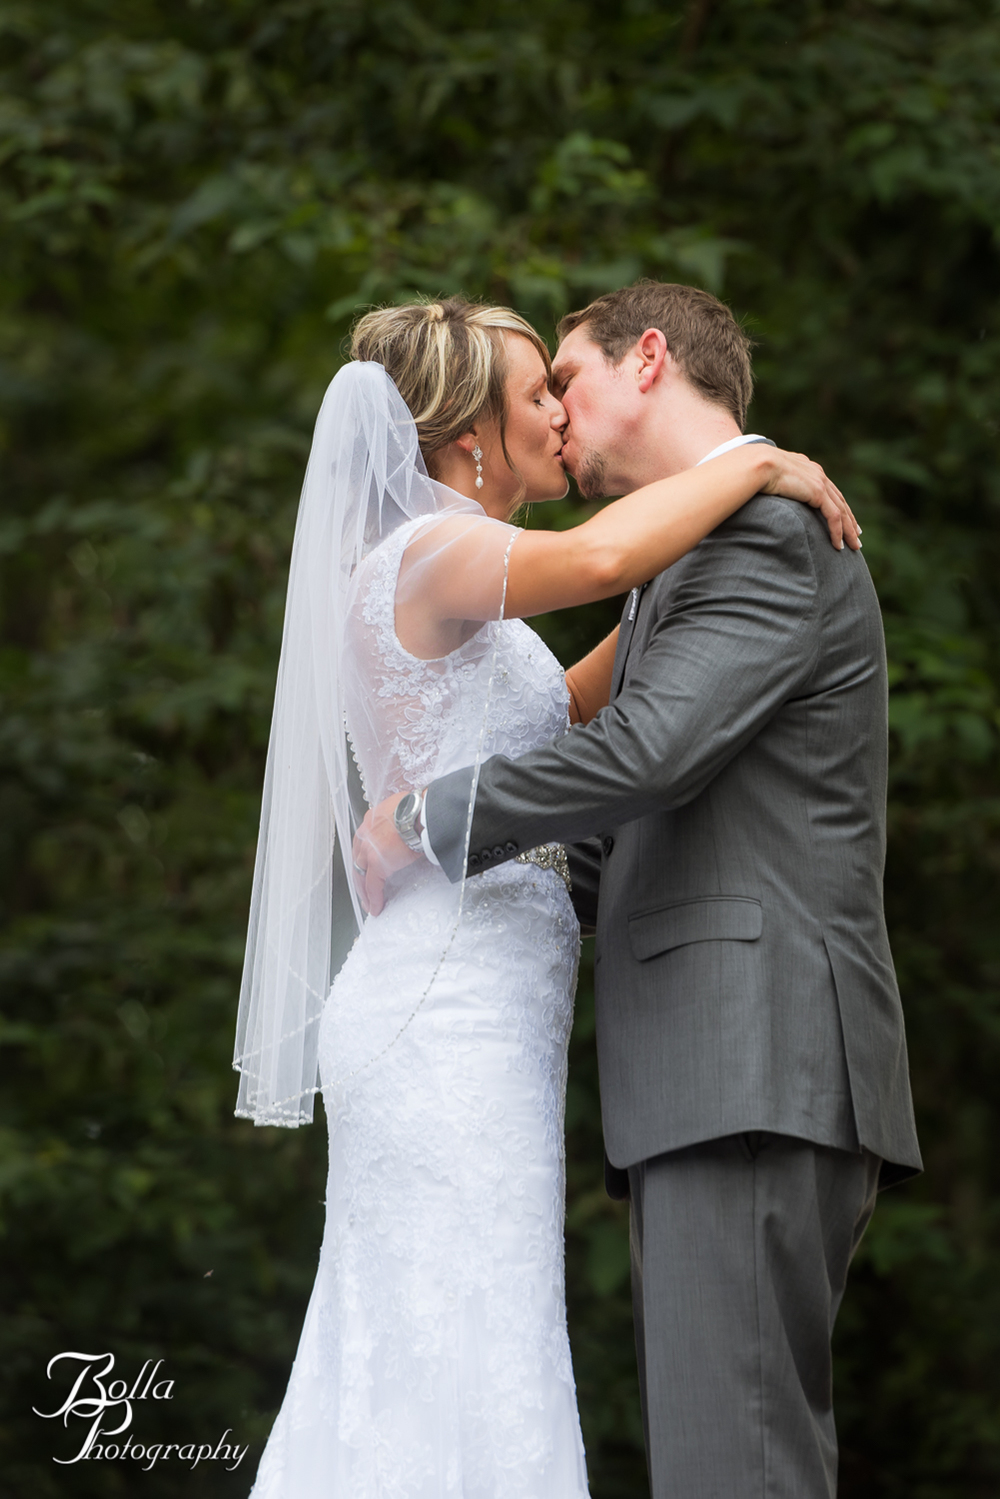 Bolla_Photography_St_Louis_wedding_photographer-0268.jpg